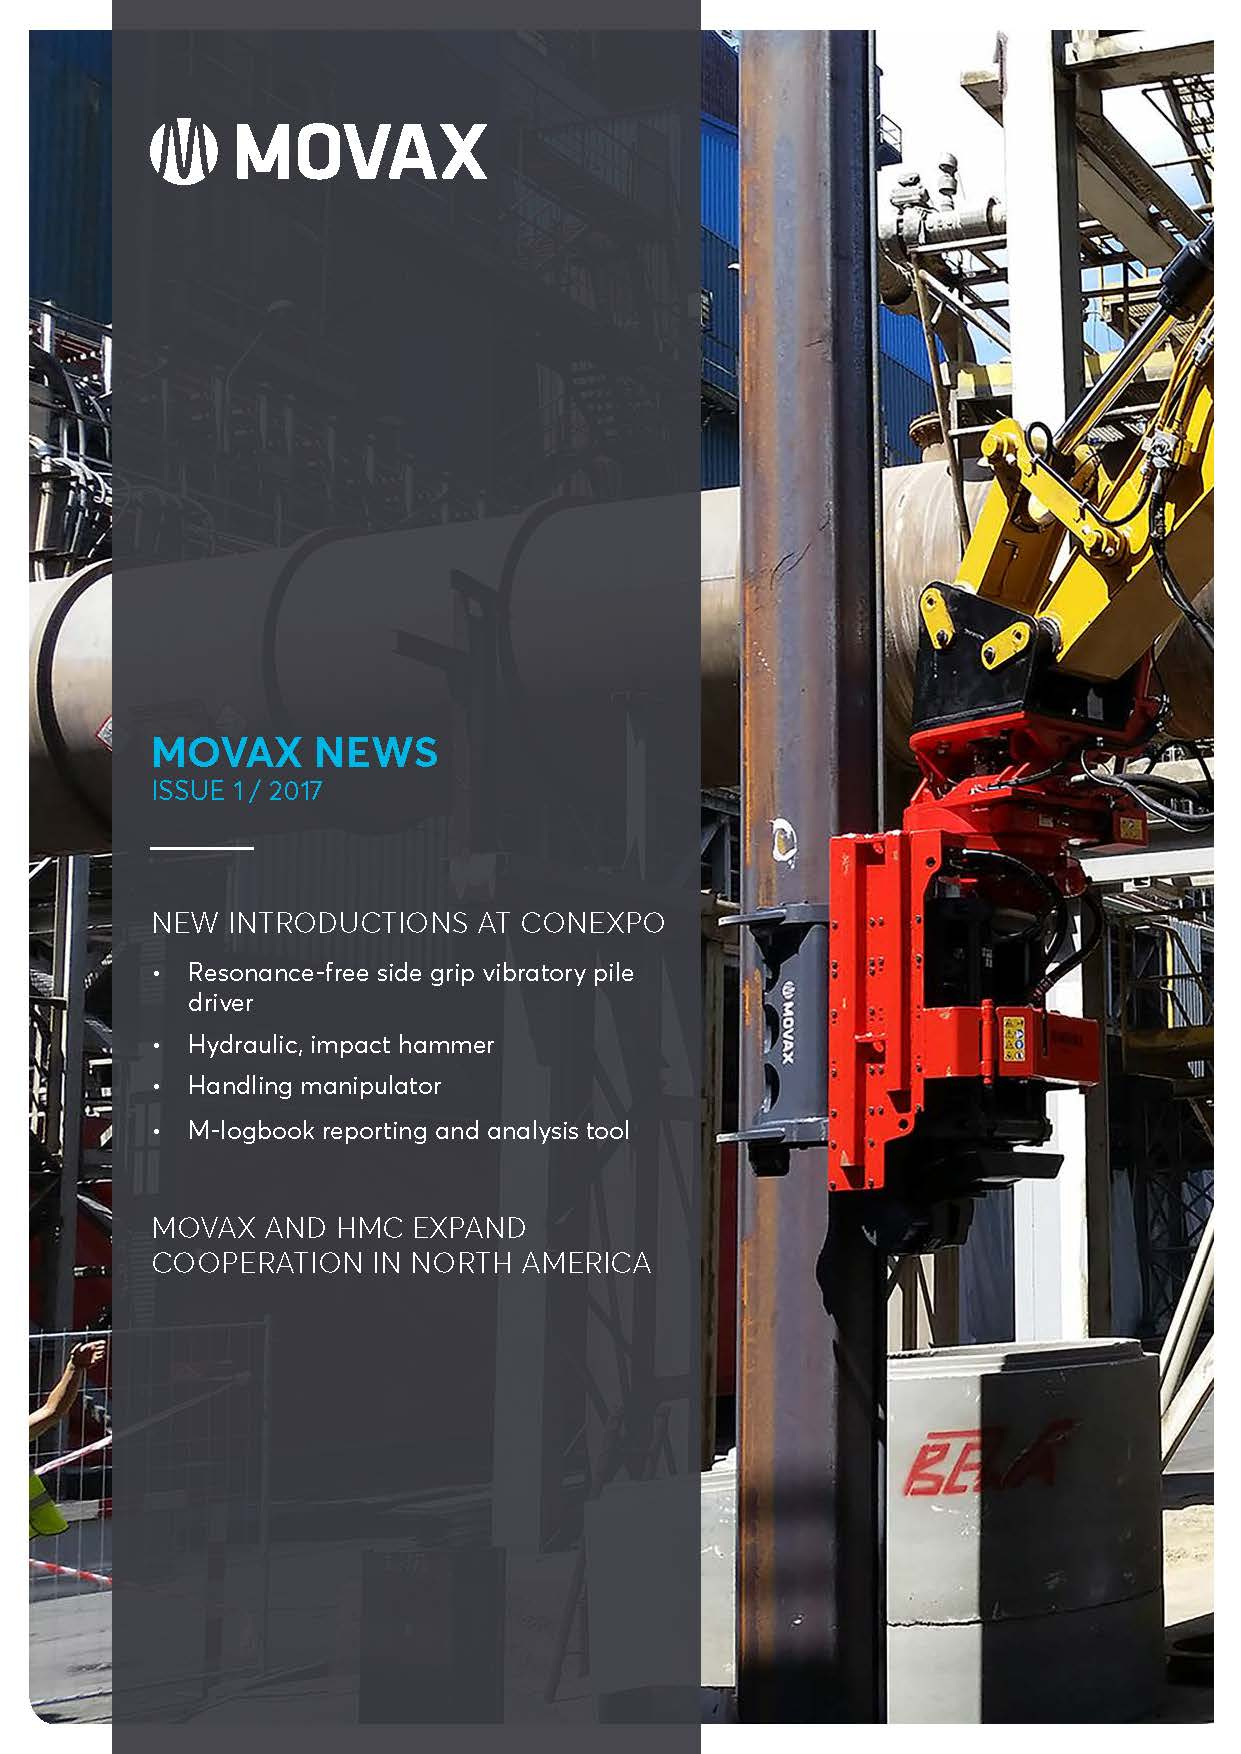 Movax News 01/2017